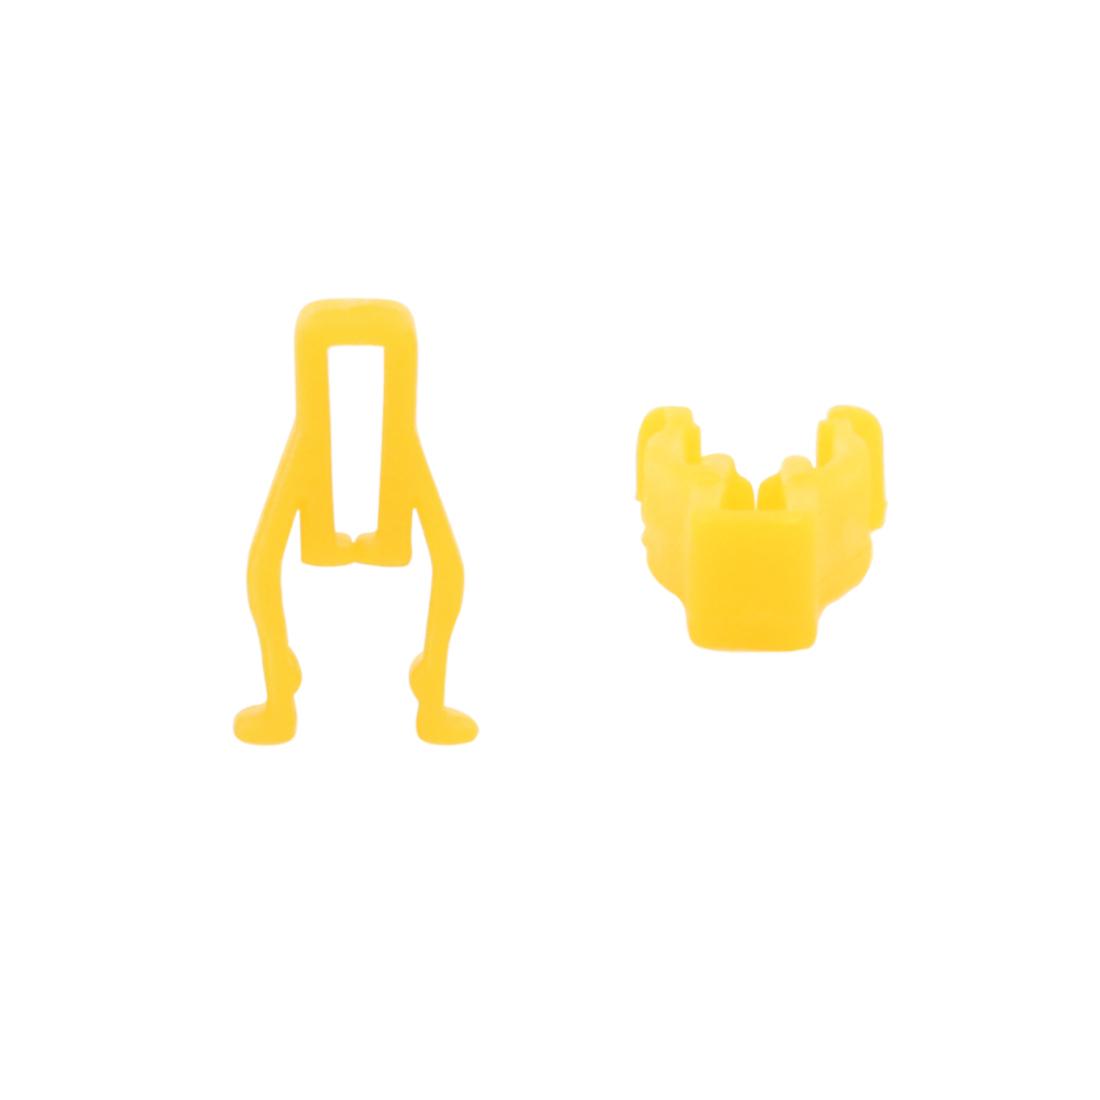 50Pcs Universal Plastic Rivet Trim Fastener Moulding Clips Yellow for Auto Car